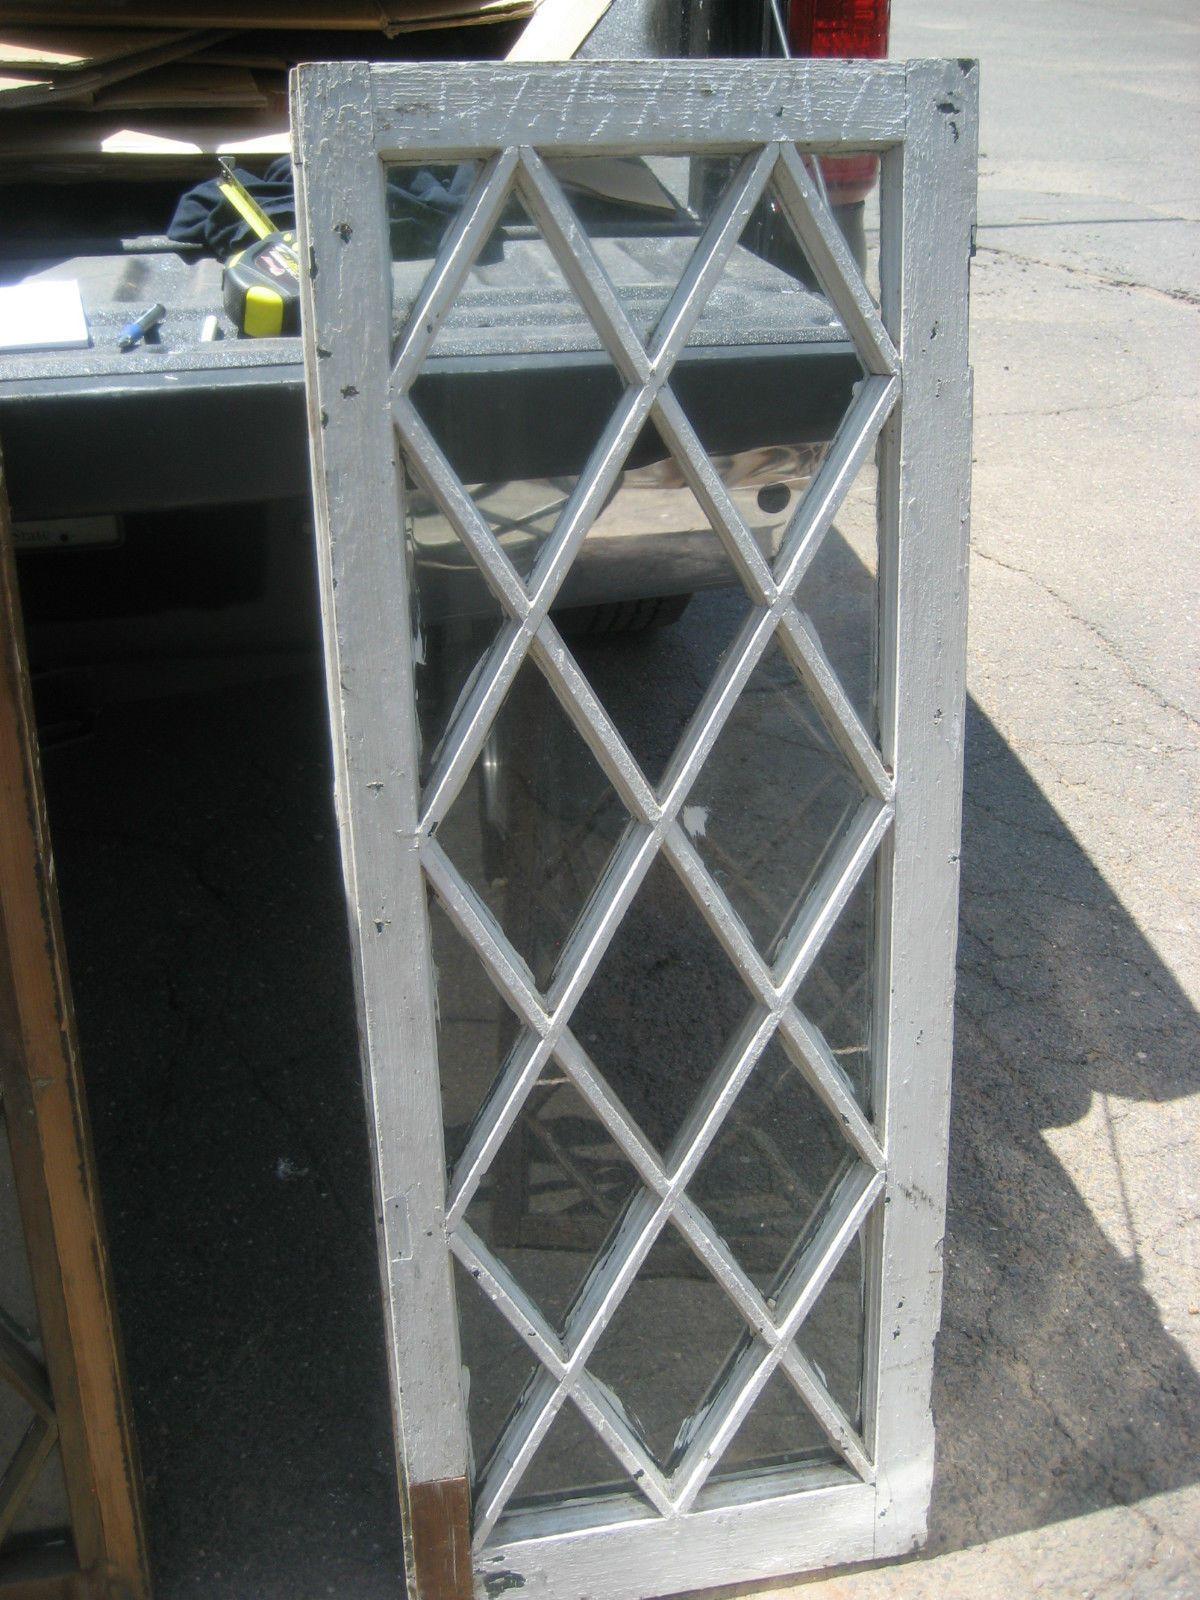 Tudor Windows antique c1900 mission style tudor diamond pane window door frame